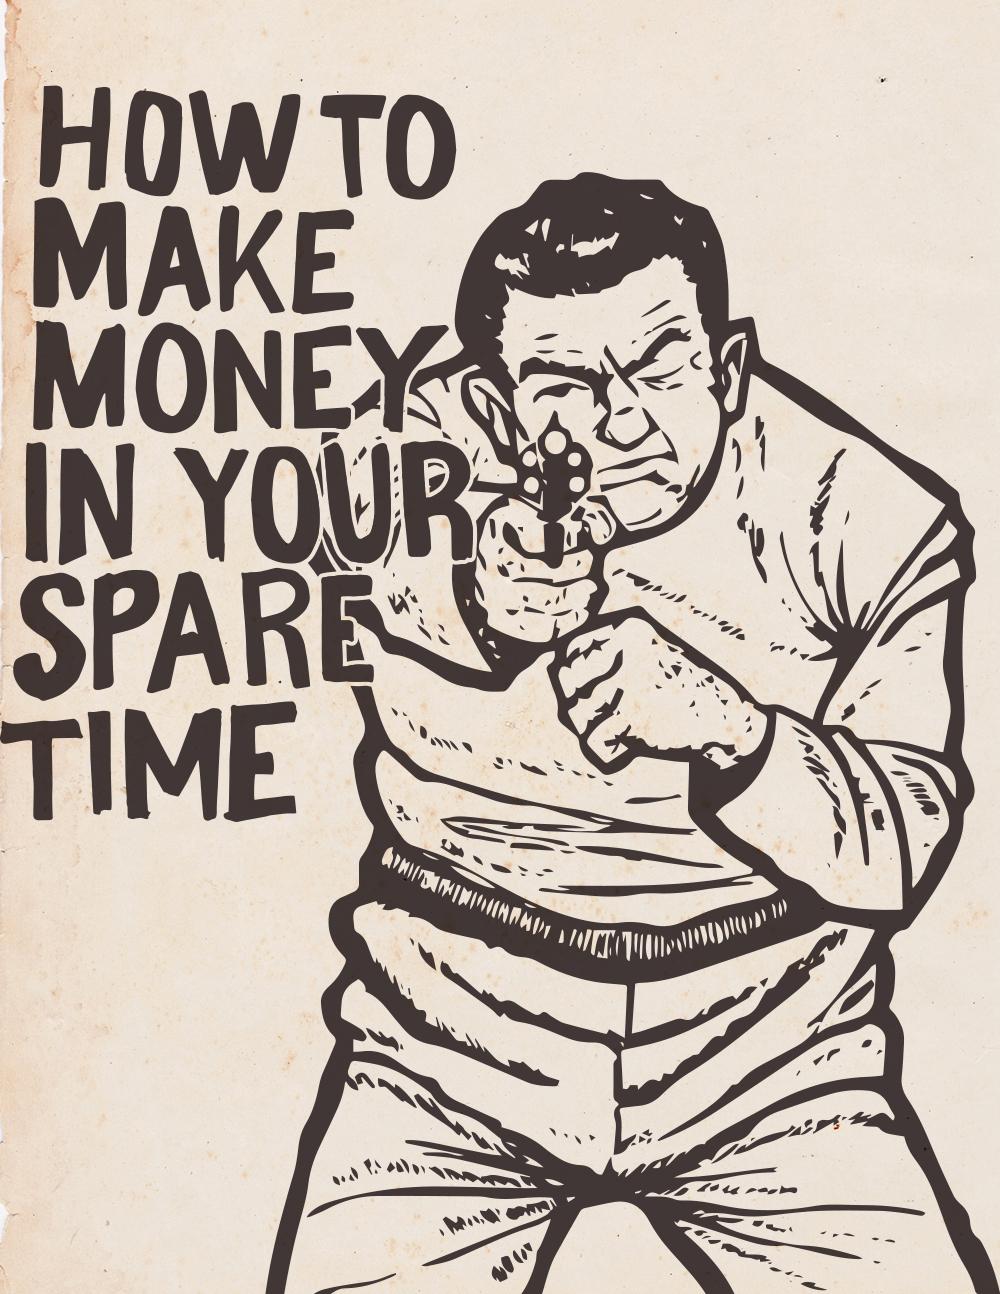 HOW TO MAKE MONEY.jpg